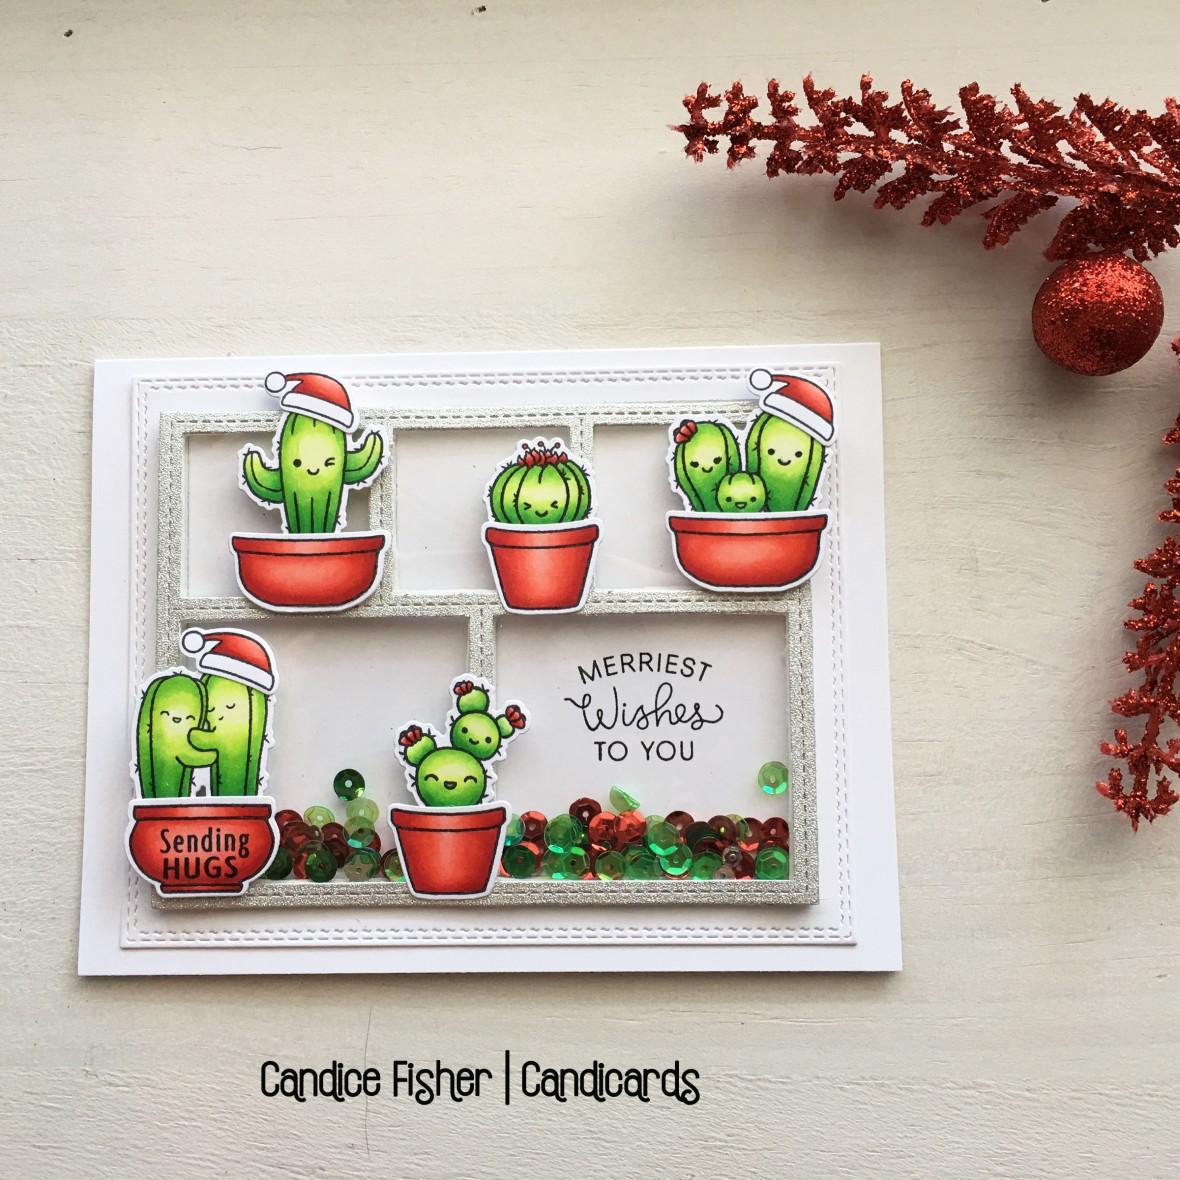 sugar peas challenge #50